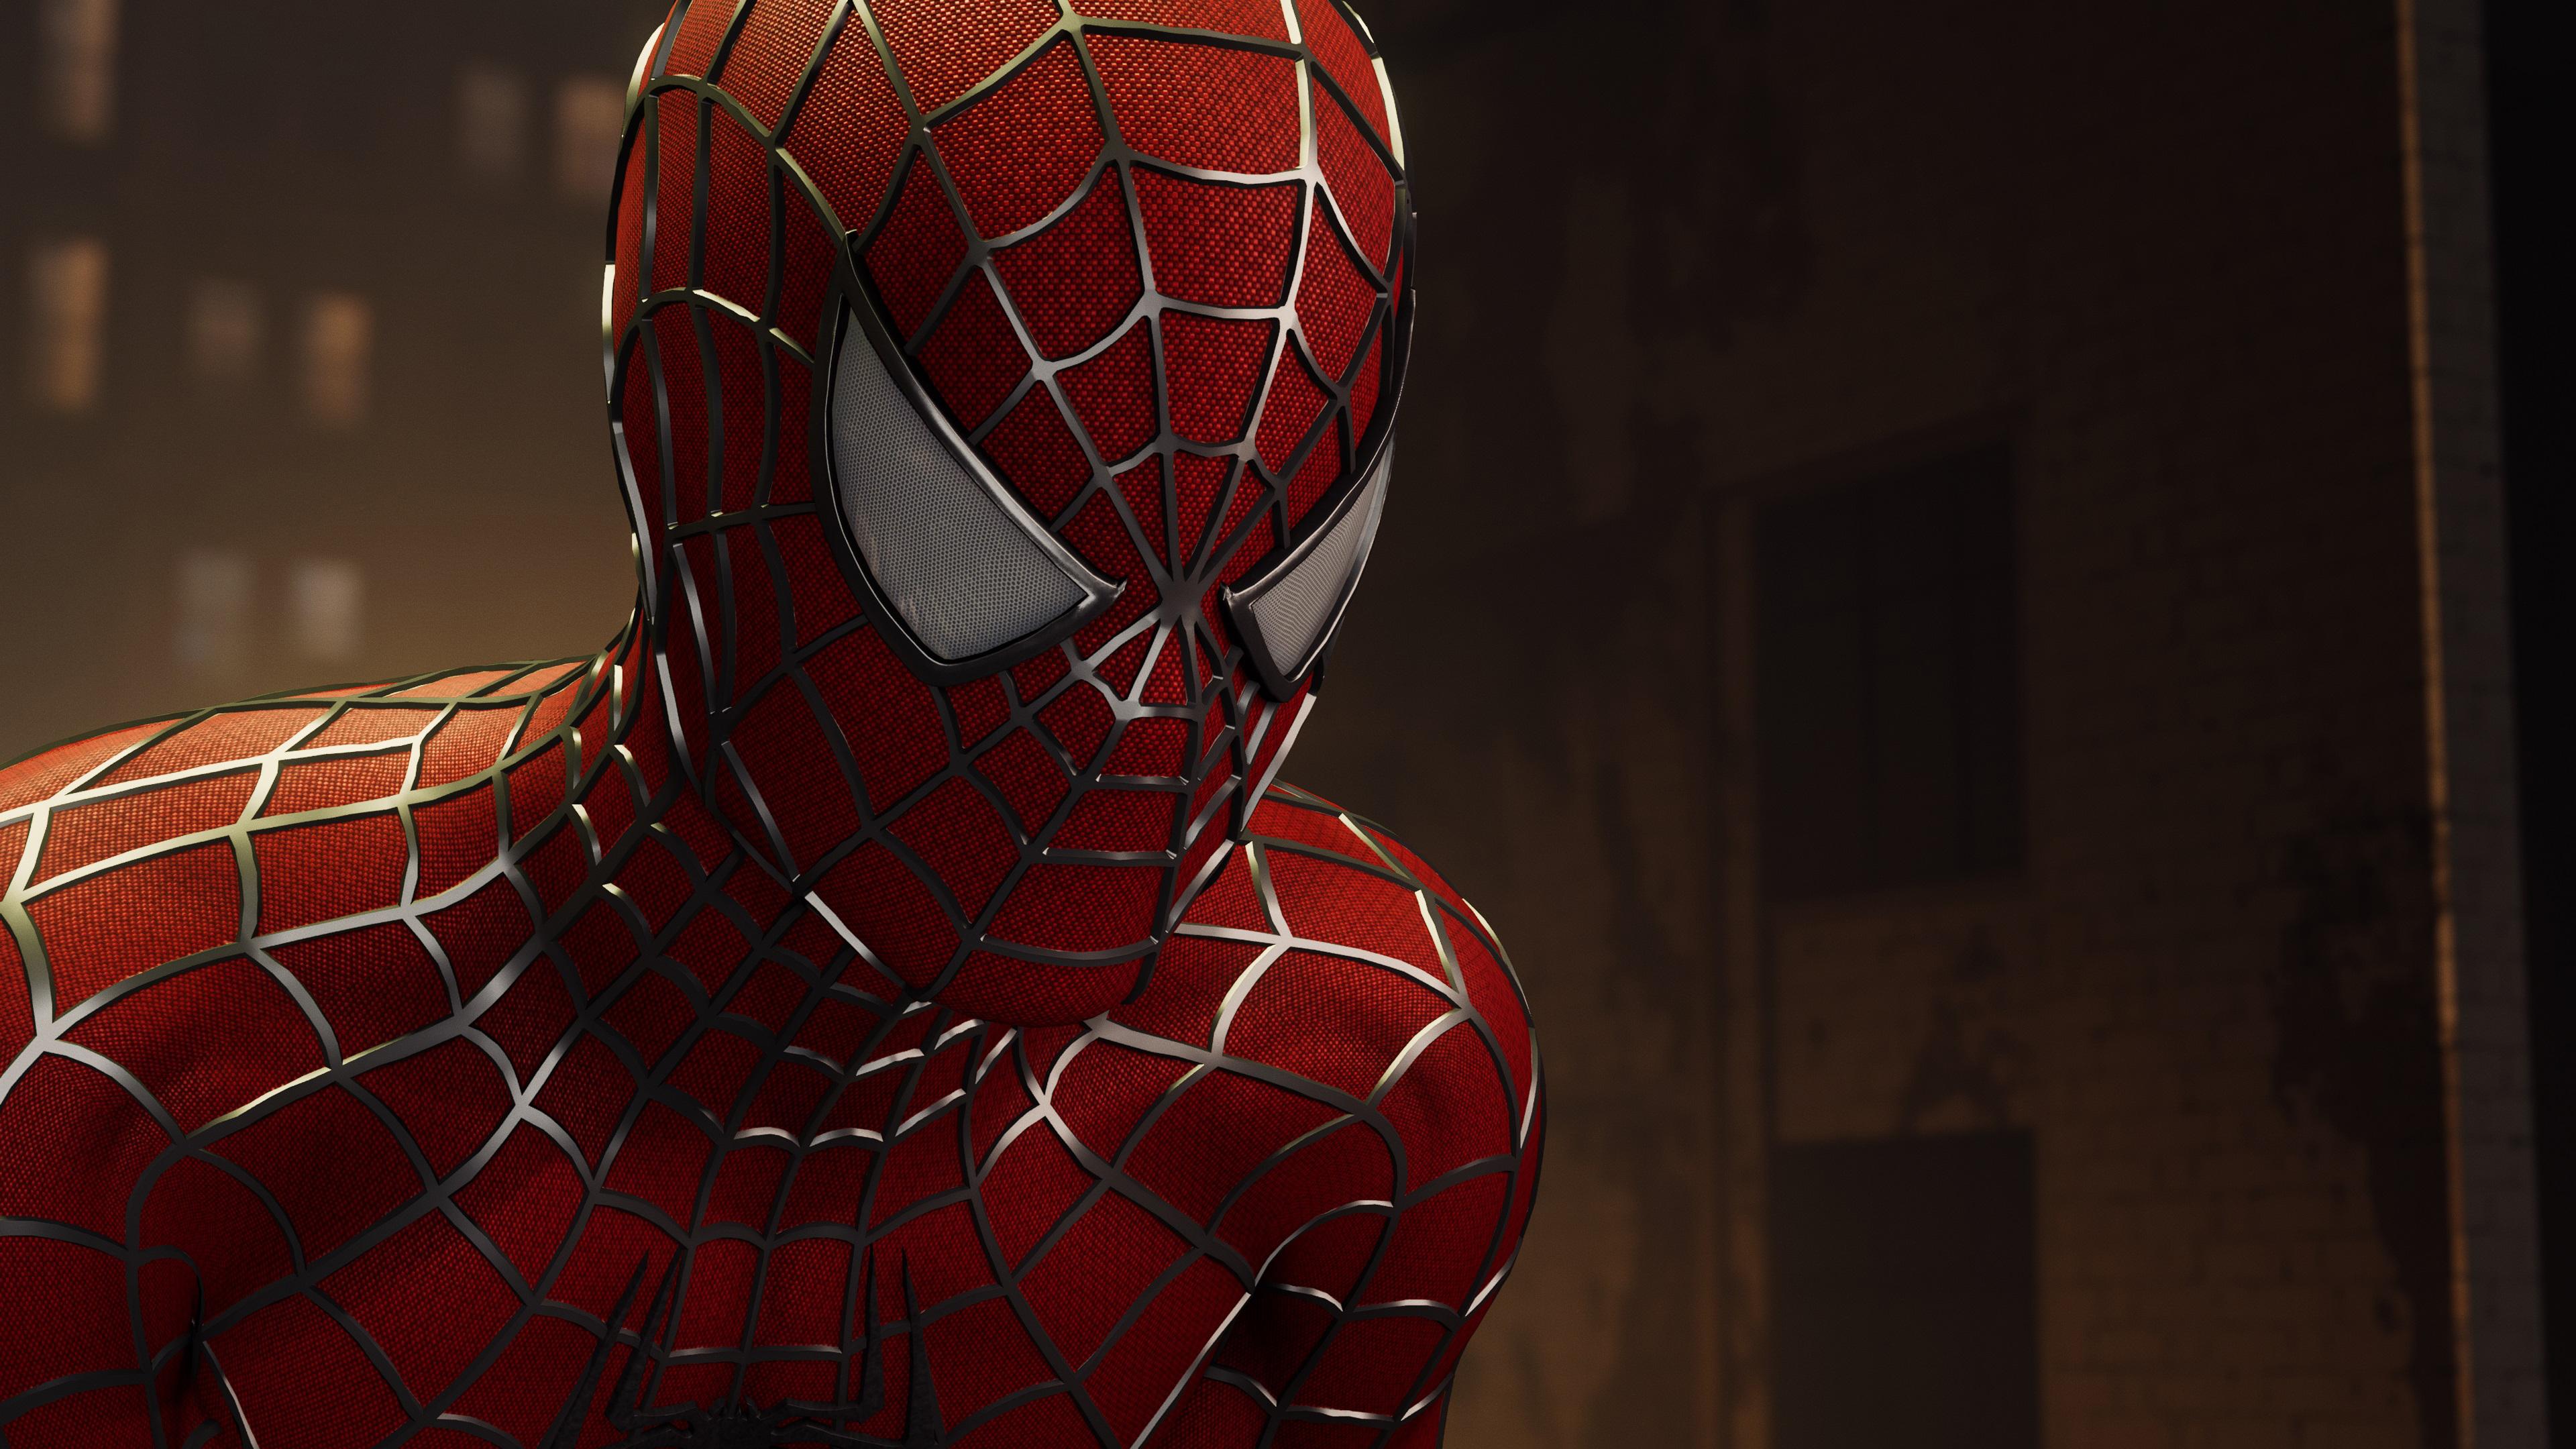 Spiderman 4k 2019, HD Games, 4k Wallpapers, Images ...